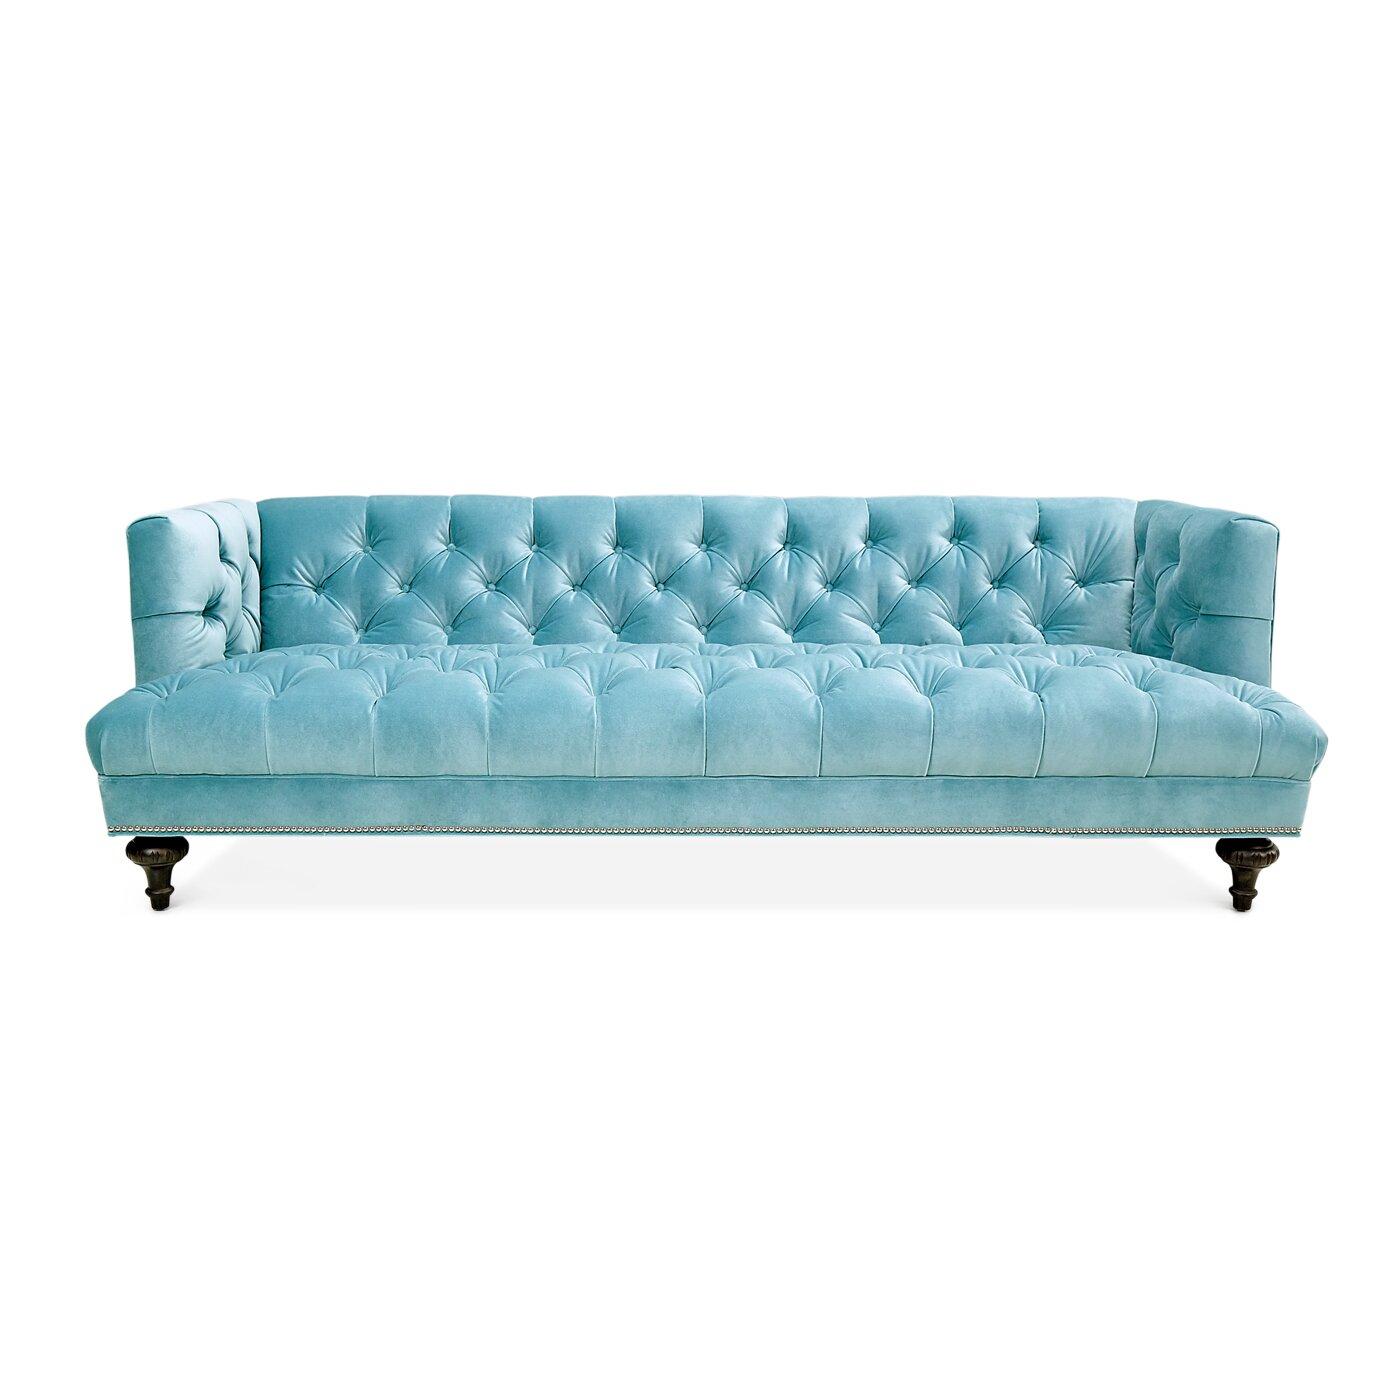 jonathan adler baxter sofa wayfair supply. Black Bedroom Furniture Sets. Home Design Ideas